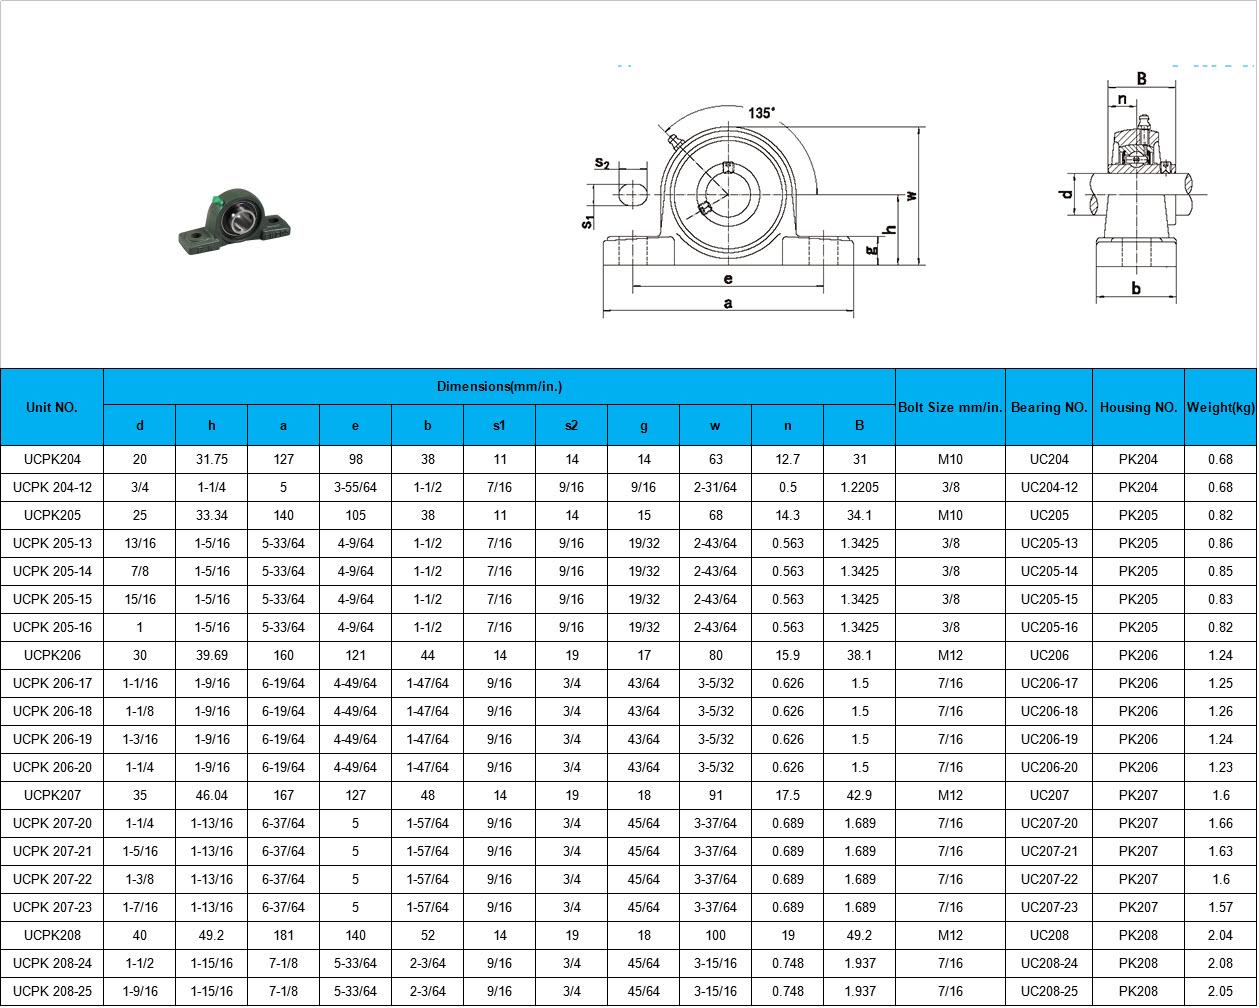 UCPK204 | UCPK 204-12 | UCPK205 | UCPK 205-13 | UCPK 205-14 | UCPK 205-15 | UCPK 205-16 | UCPK206 | UCPK 206-17 | UCPK 206-18 | UCPK 206-19 | UCPK 206-20 | UCPK207 | UCPK 207-20 | UCPK 207-21 | UCPK 207-22 | UCPK 207-23 | UCPK208 | UCPK 208-24 | UCPK 208-25